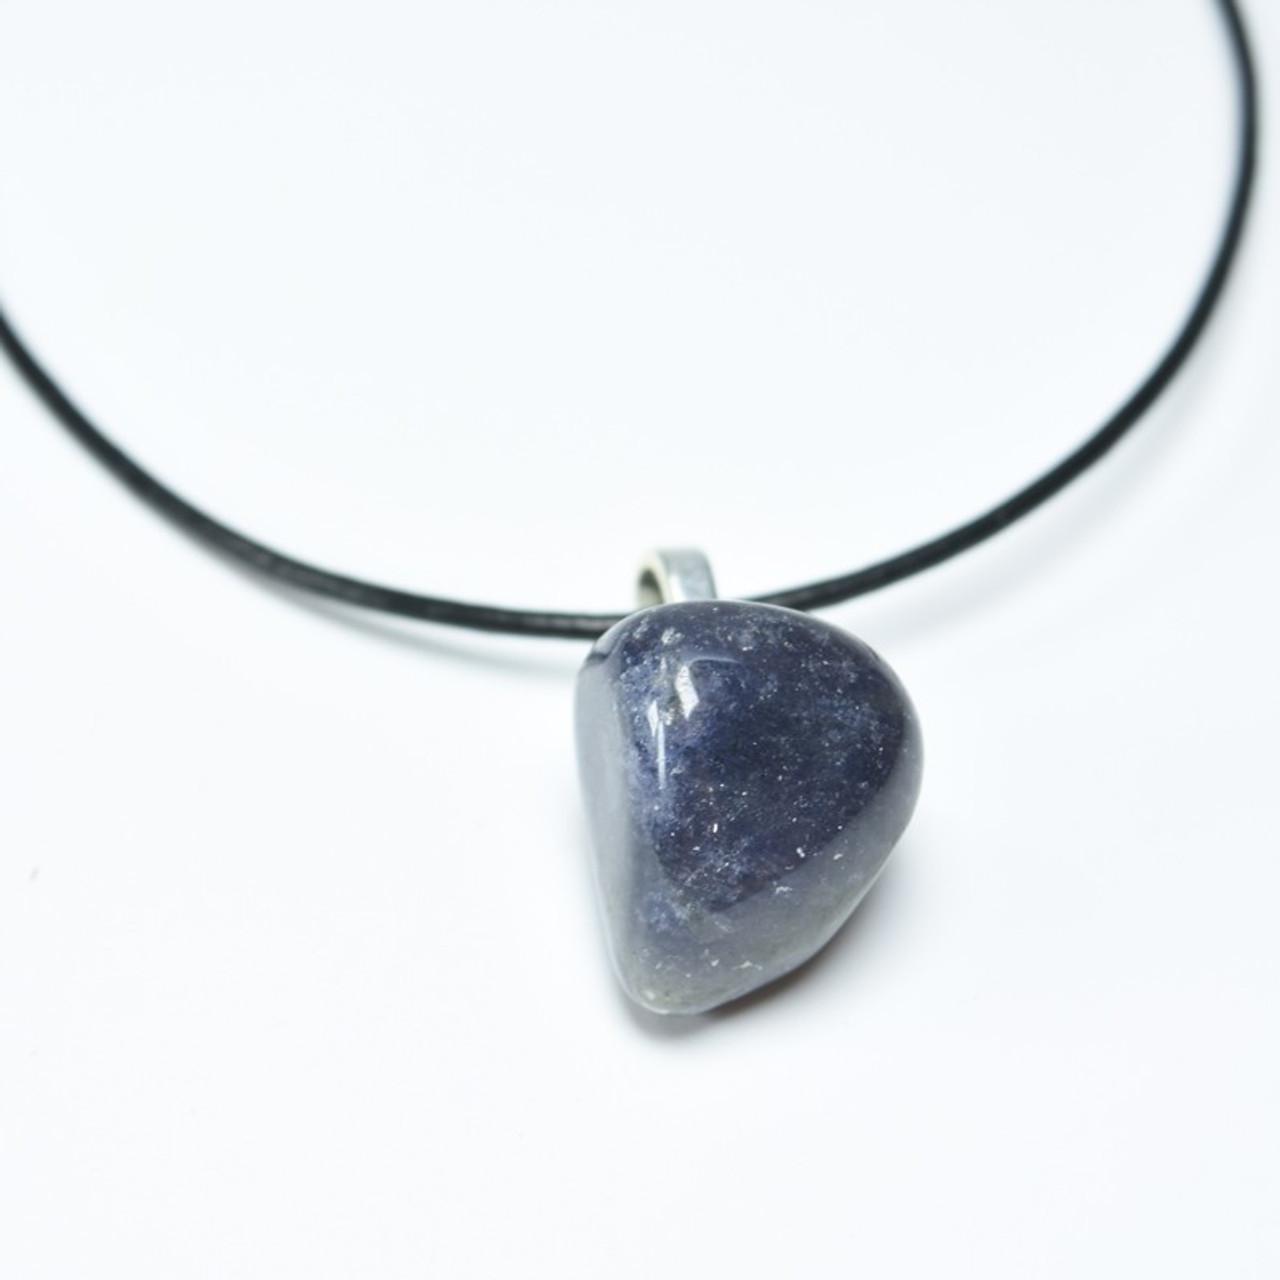 Tumbled Iolite Stone Necklace